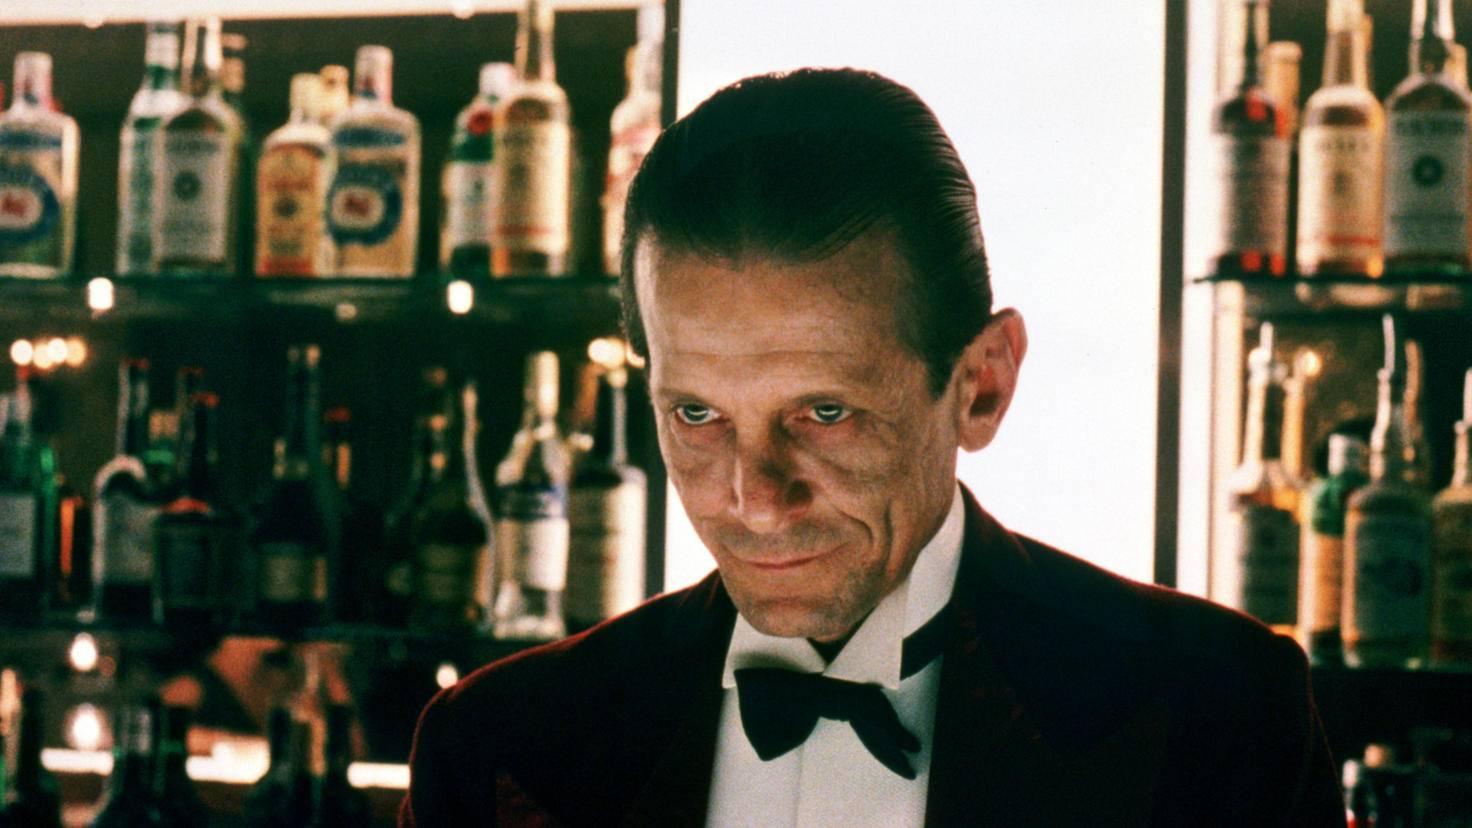 The-Shining-Barkeeper